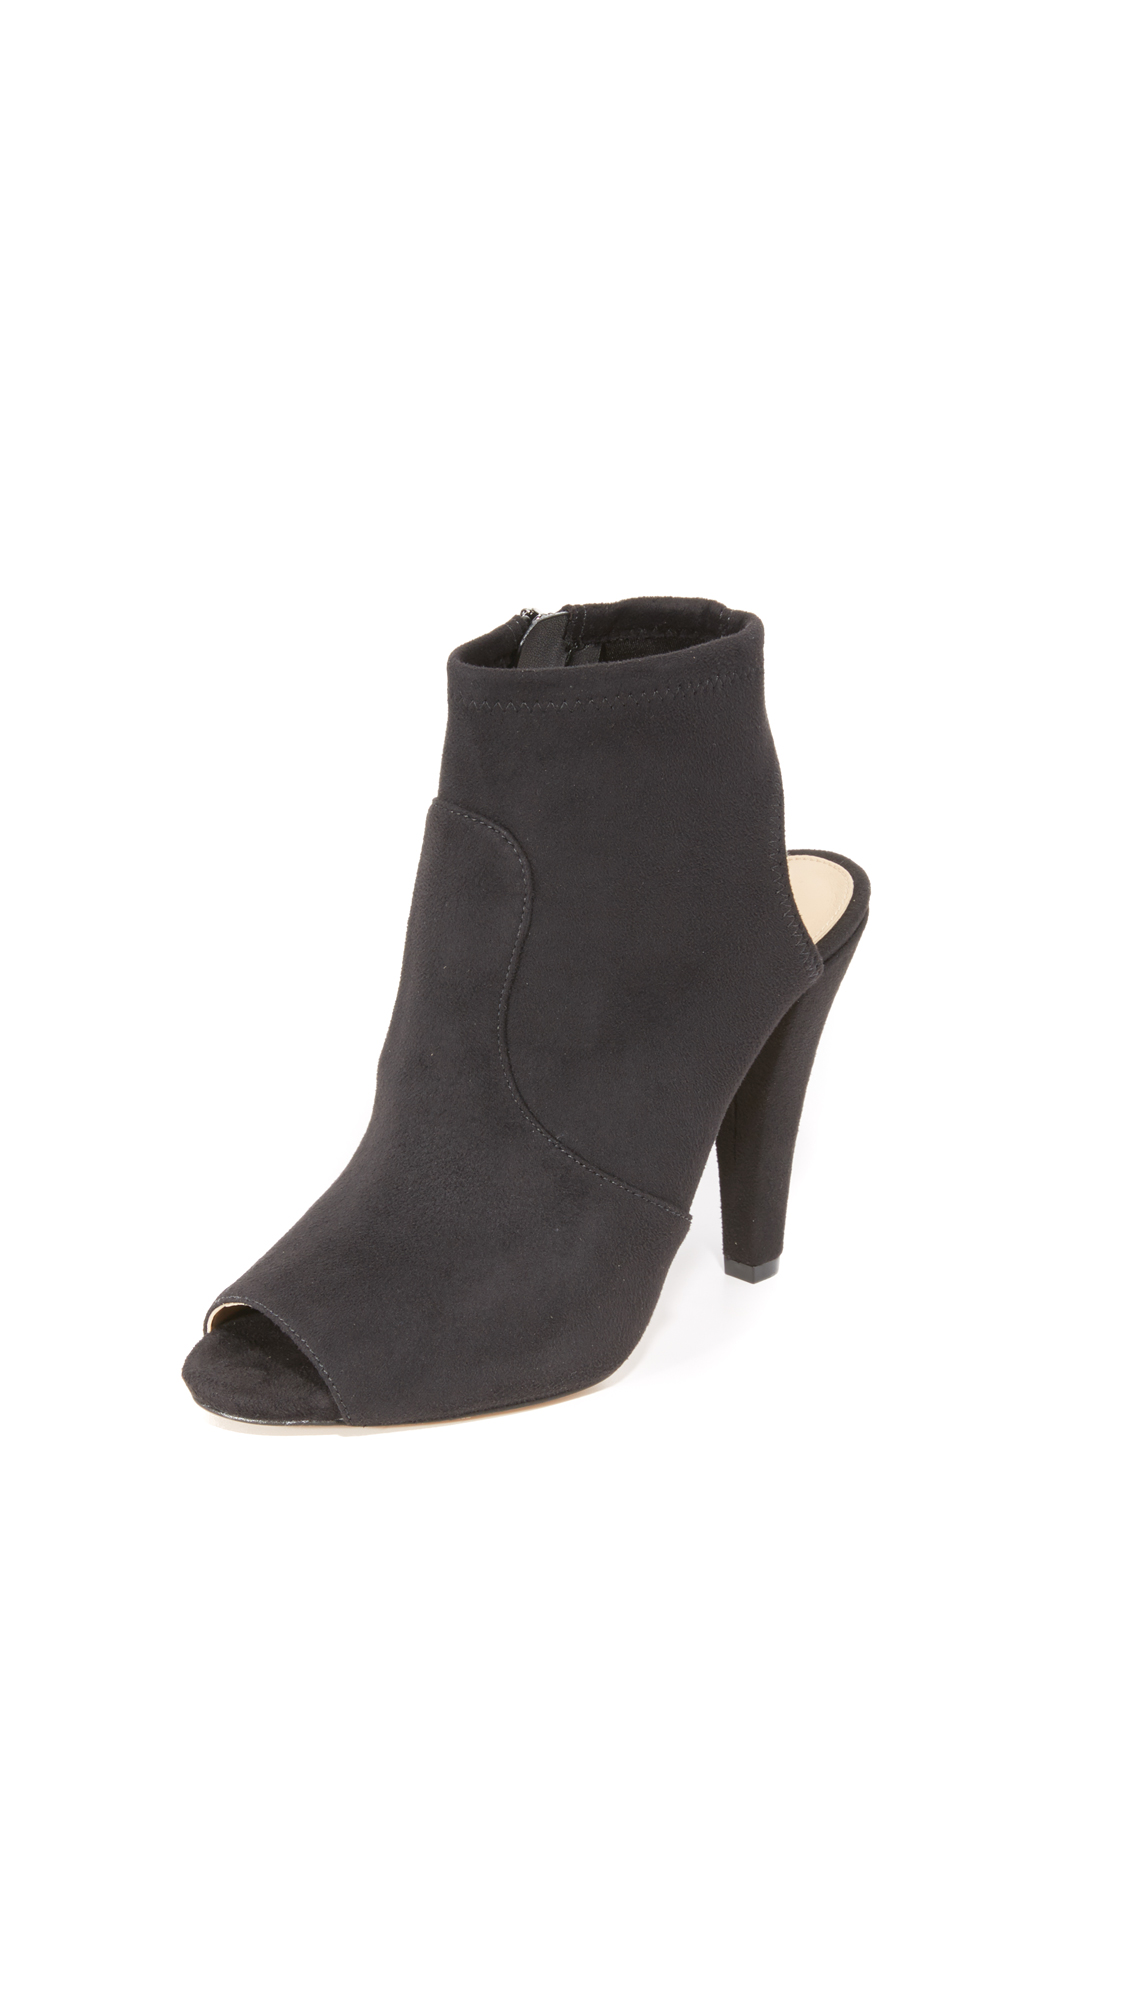 Michael Michael Kors Selina Open Toe Booties - Black